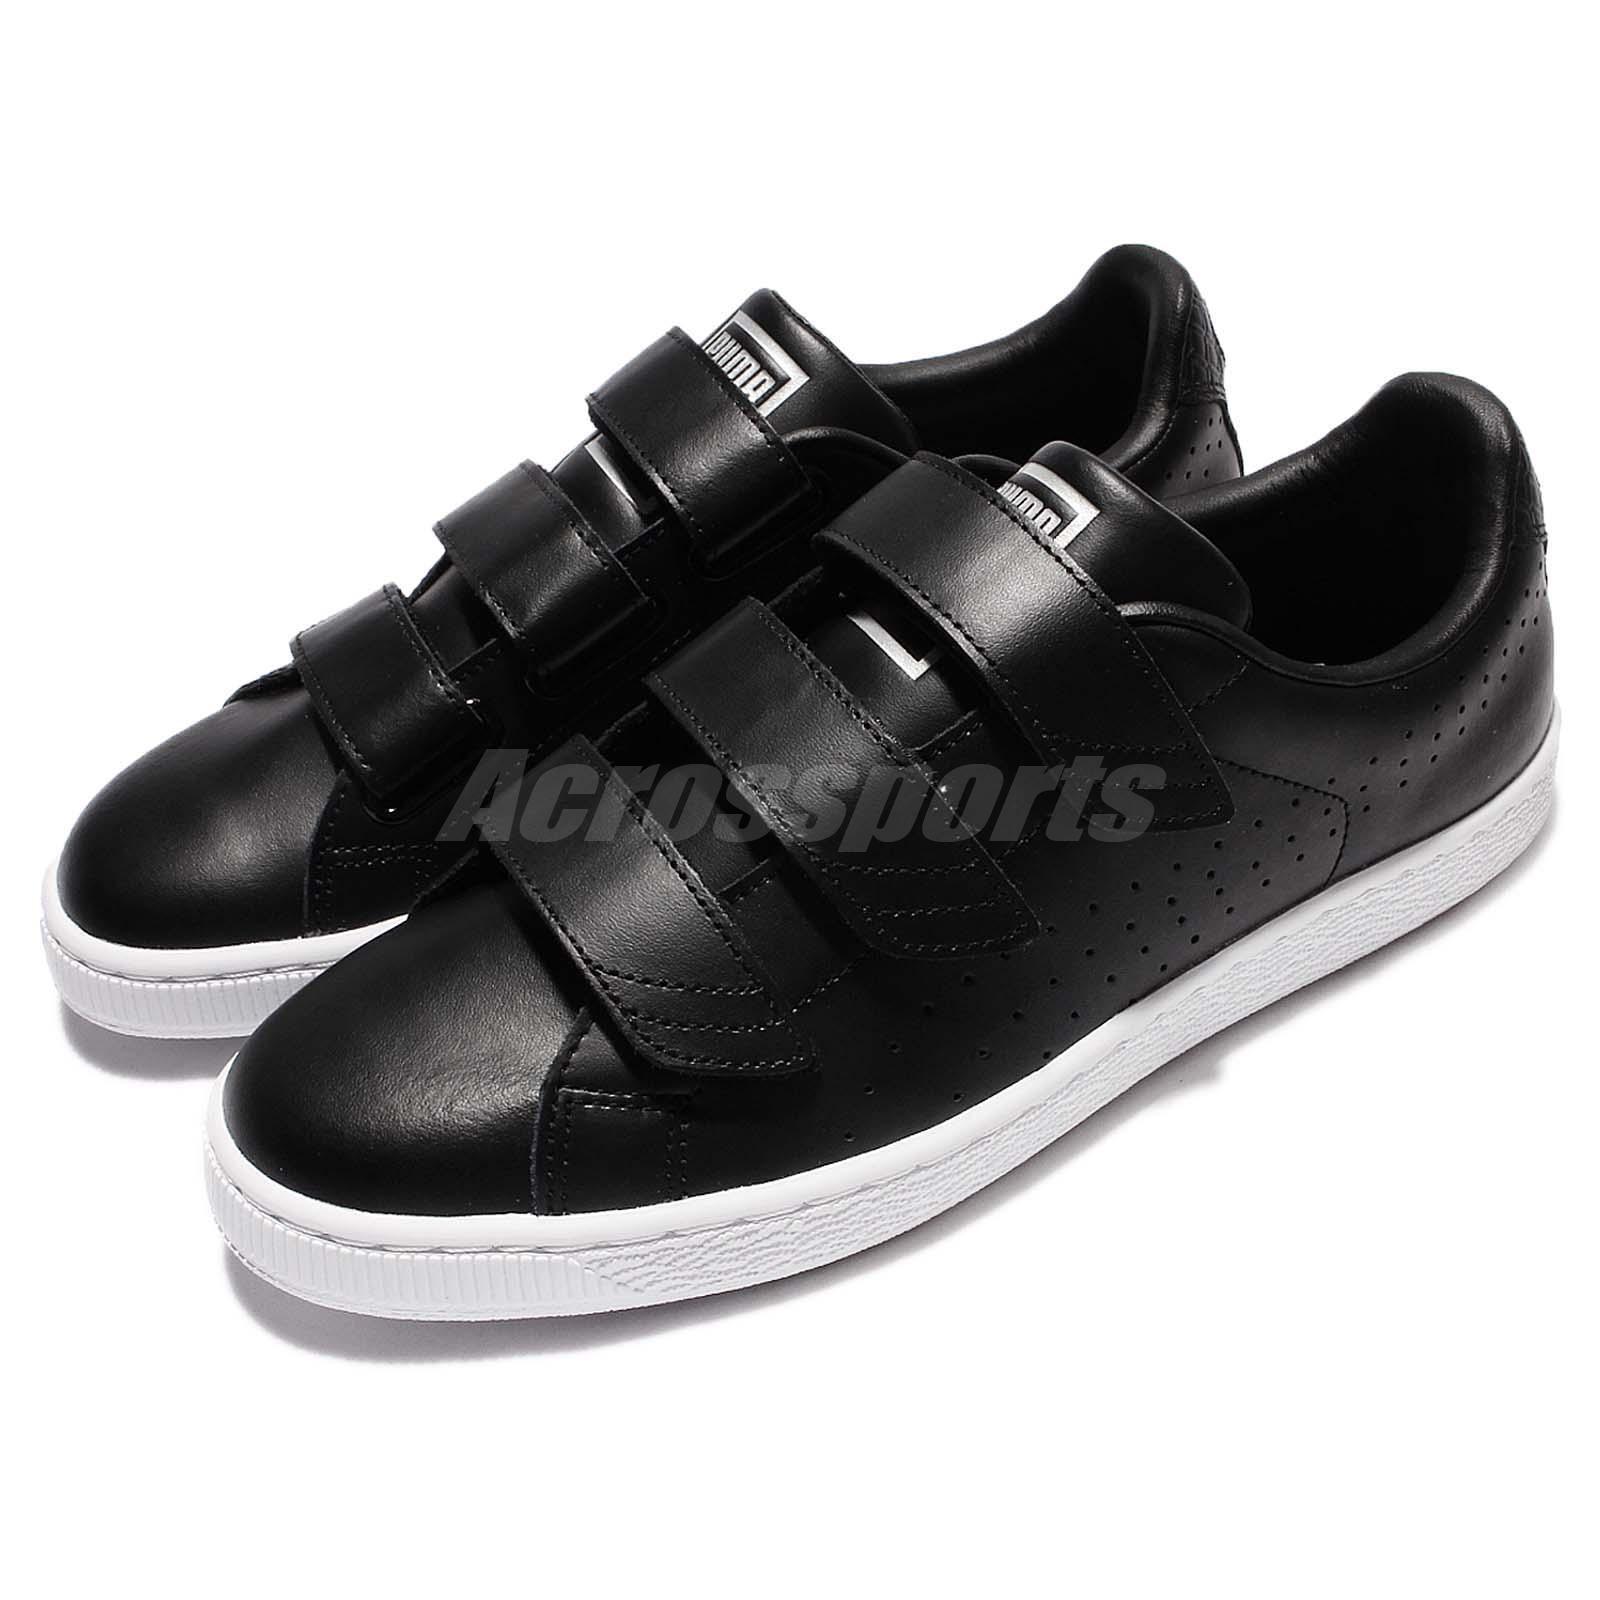 Puma Basket Classic Strap Black White Men Sports Car Casual shoes 362565-01